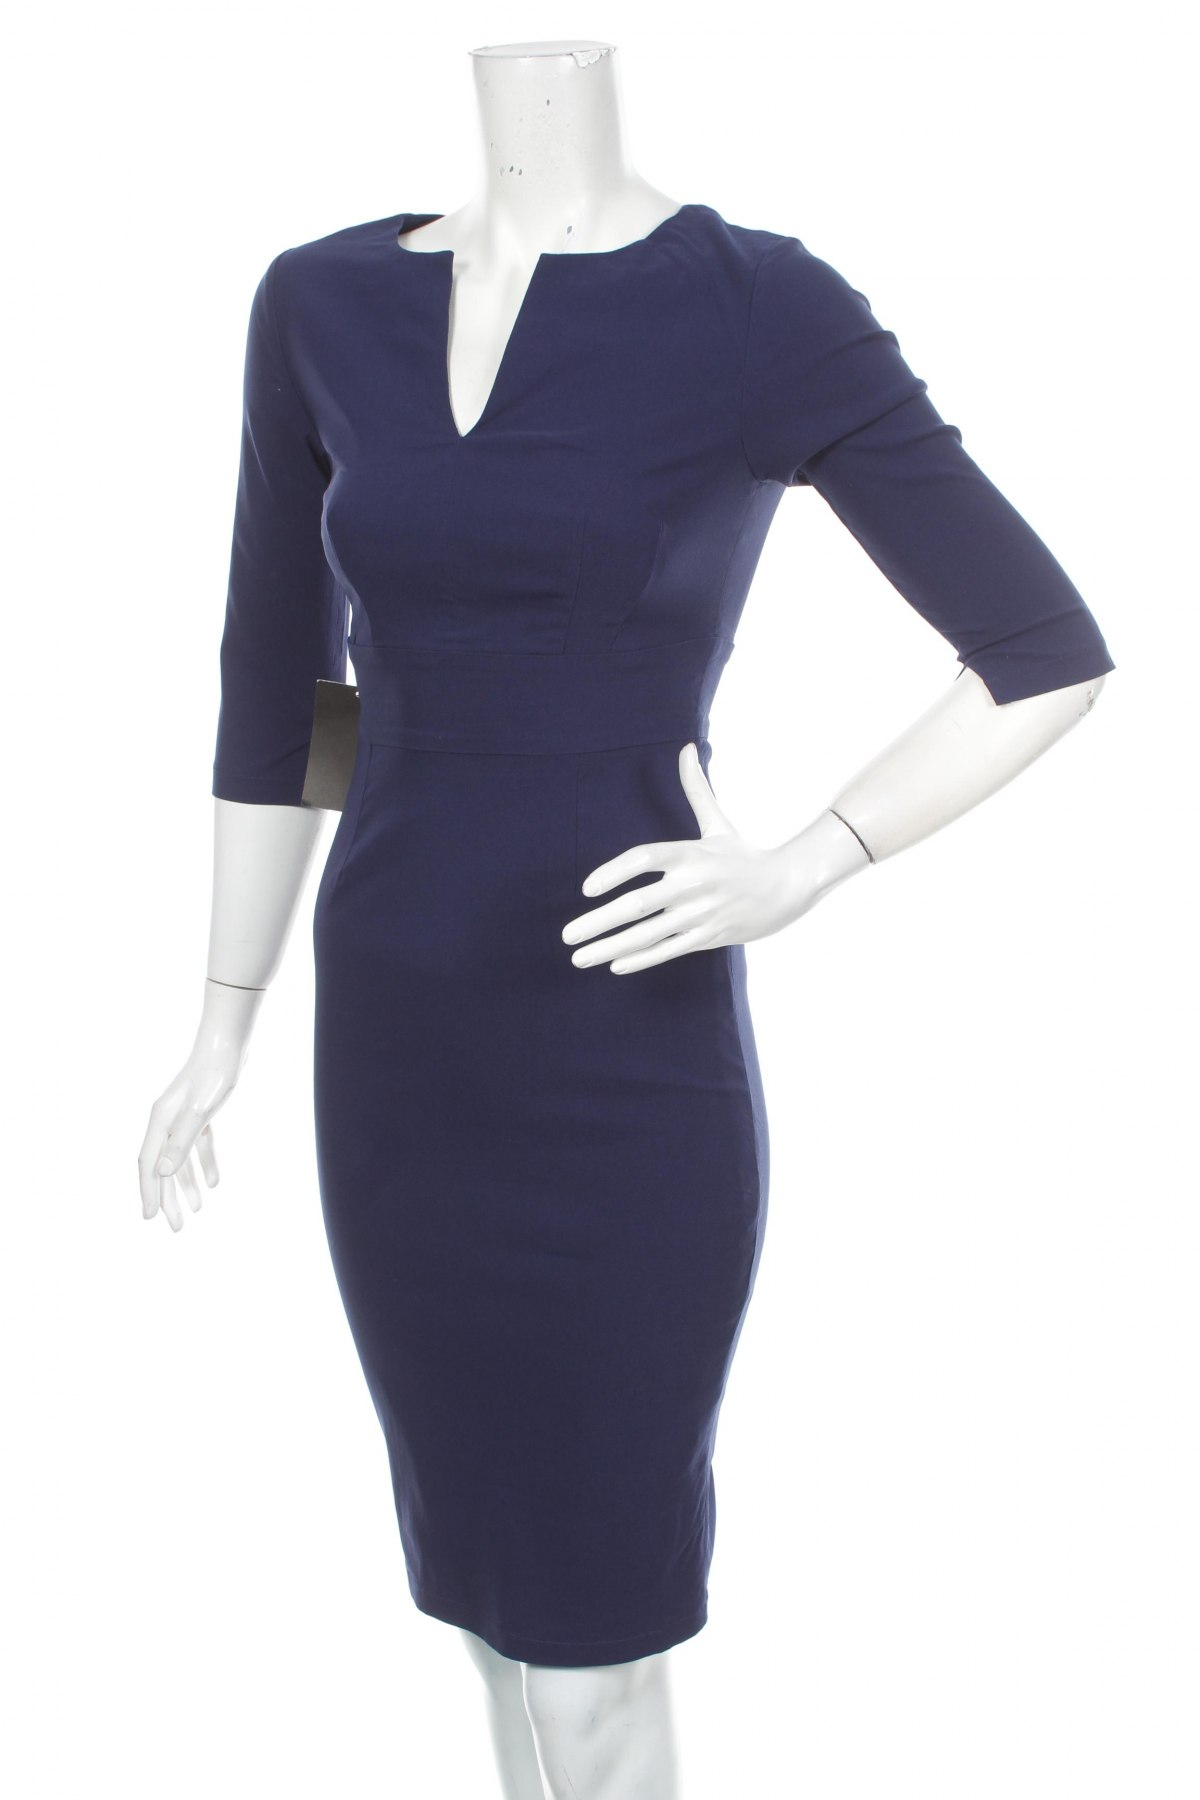 Šaty Four Flavor - za výhodné ceny na Remix -  8964877 007c773b9a8